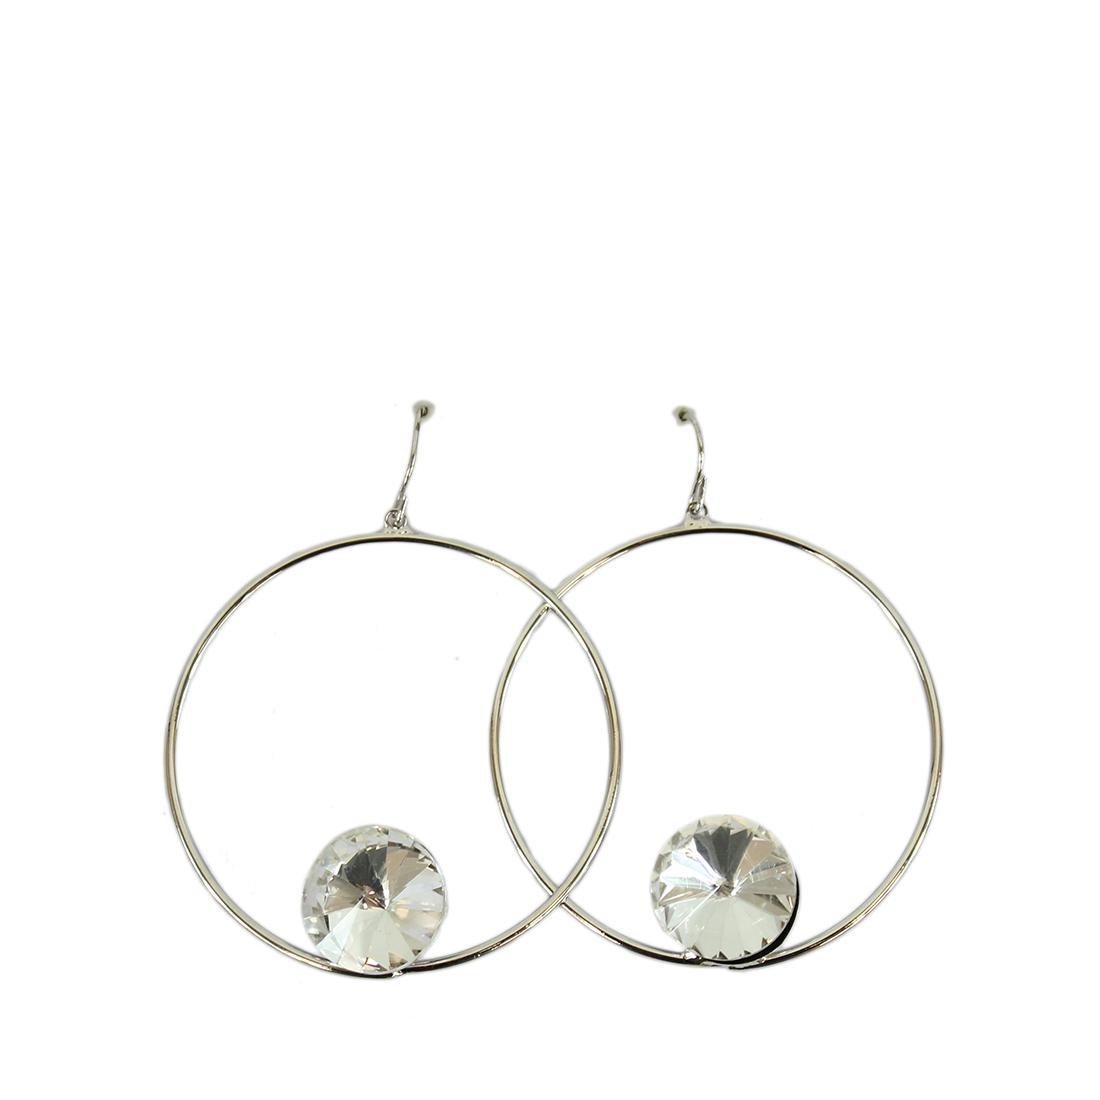 Medium hoops with big diamond